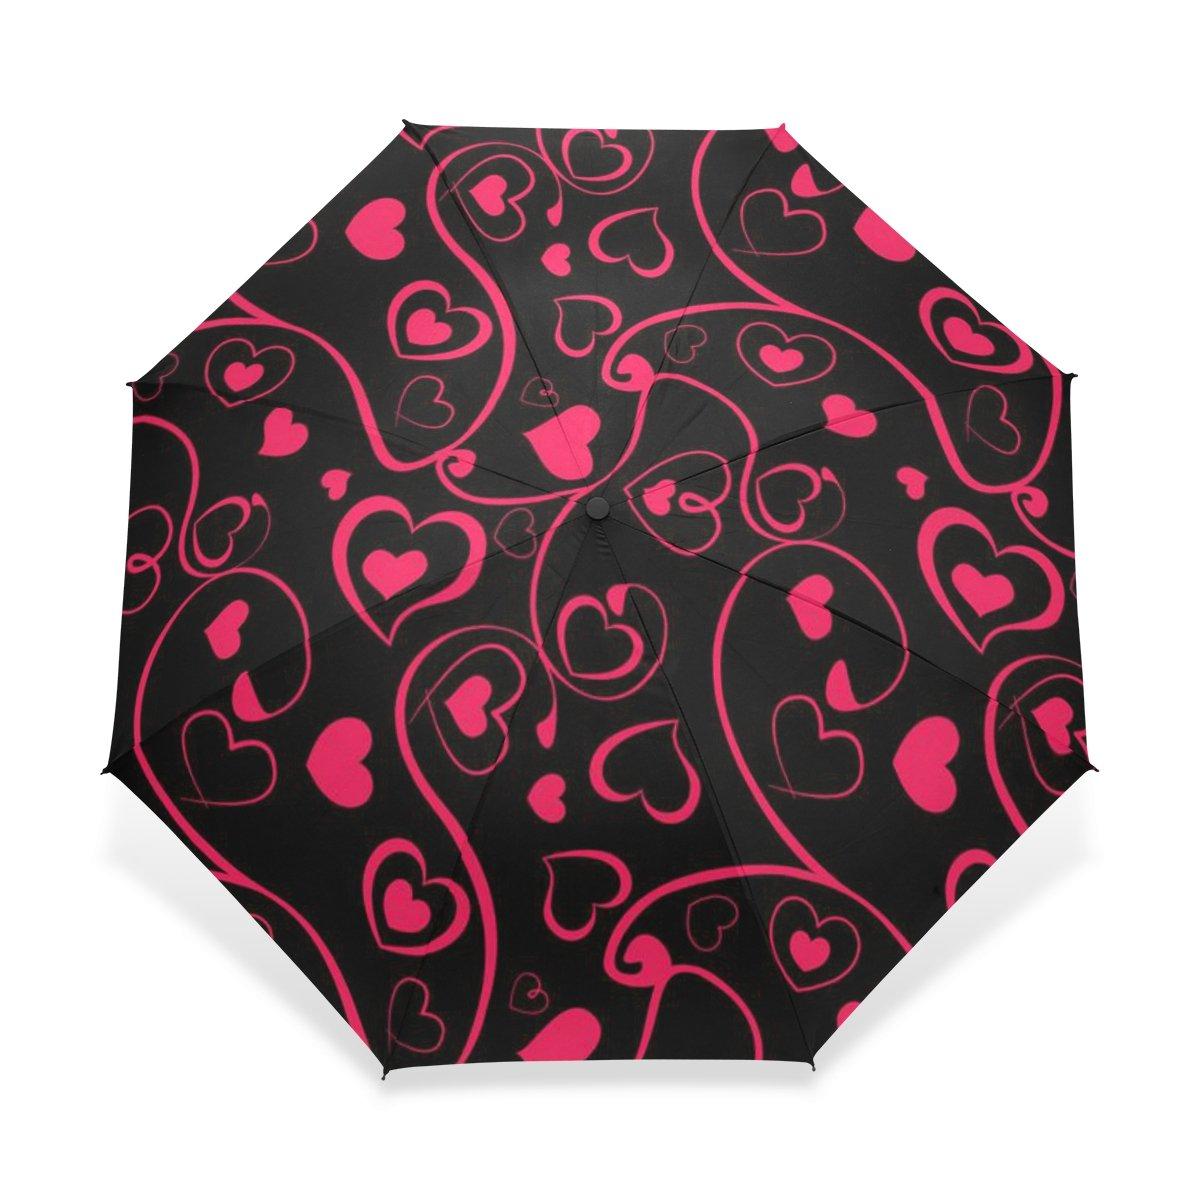 baihuishop防風ゴルフ傘、コンパクトで旅行for Easy Carryingスポーツ雨傘 – 強力なフレーム壊れないハートパターンパターン B01FQJHTVW